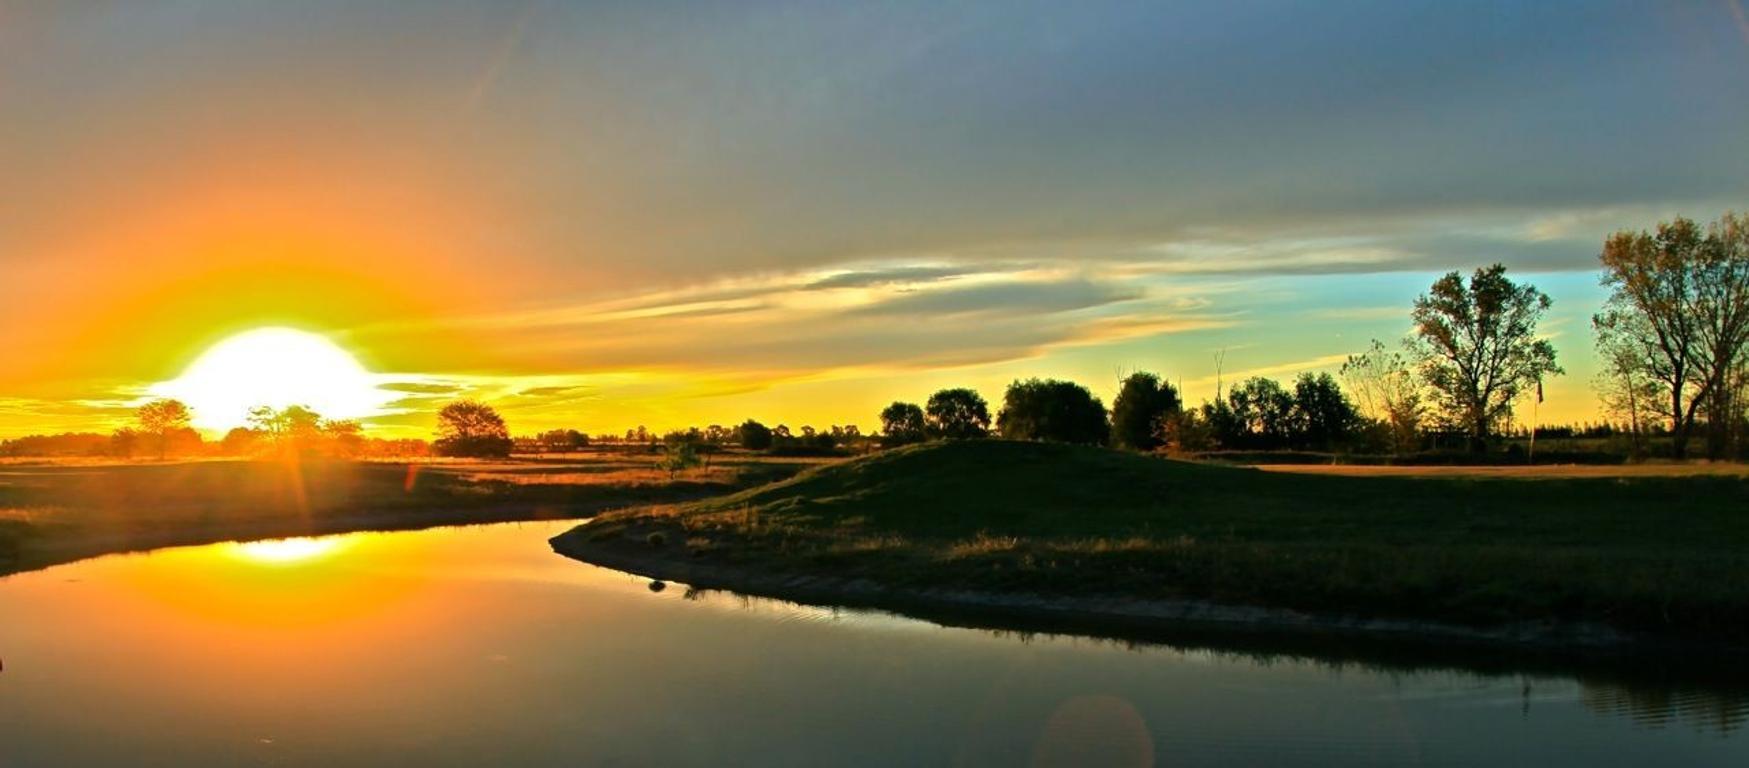 Tizado Pilar vende lotes al golf en Medal CC, Pilar y Alrededores - PIL3849_LP172634_1